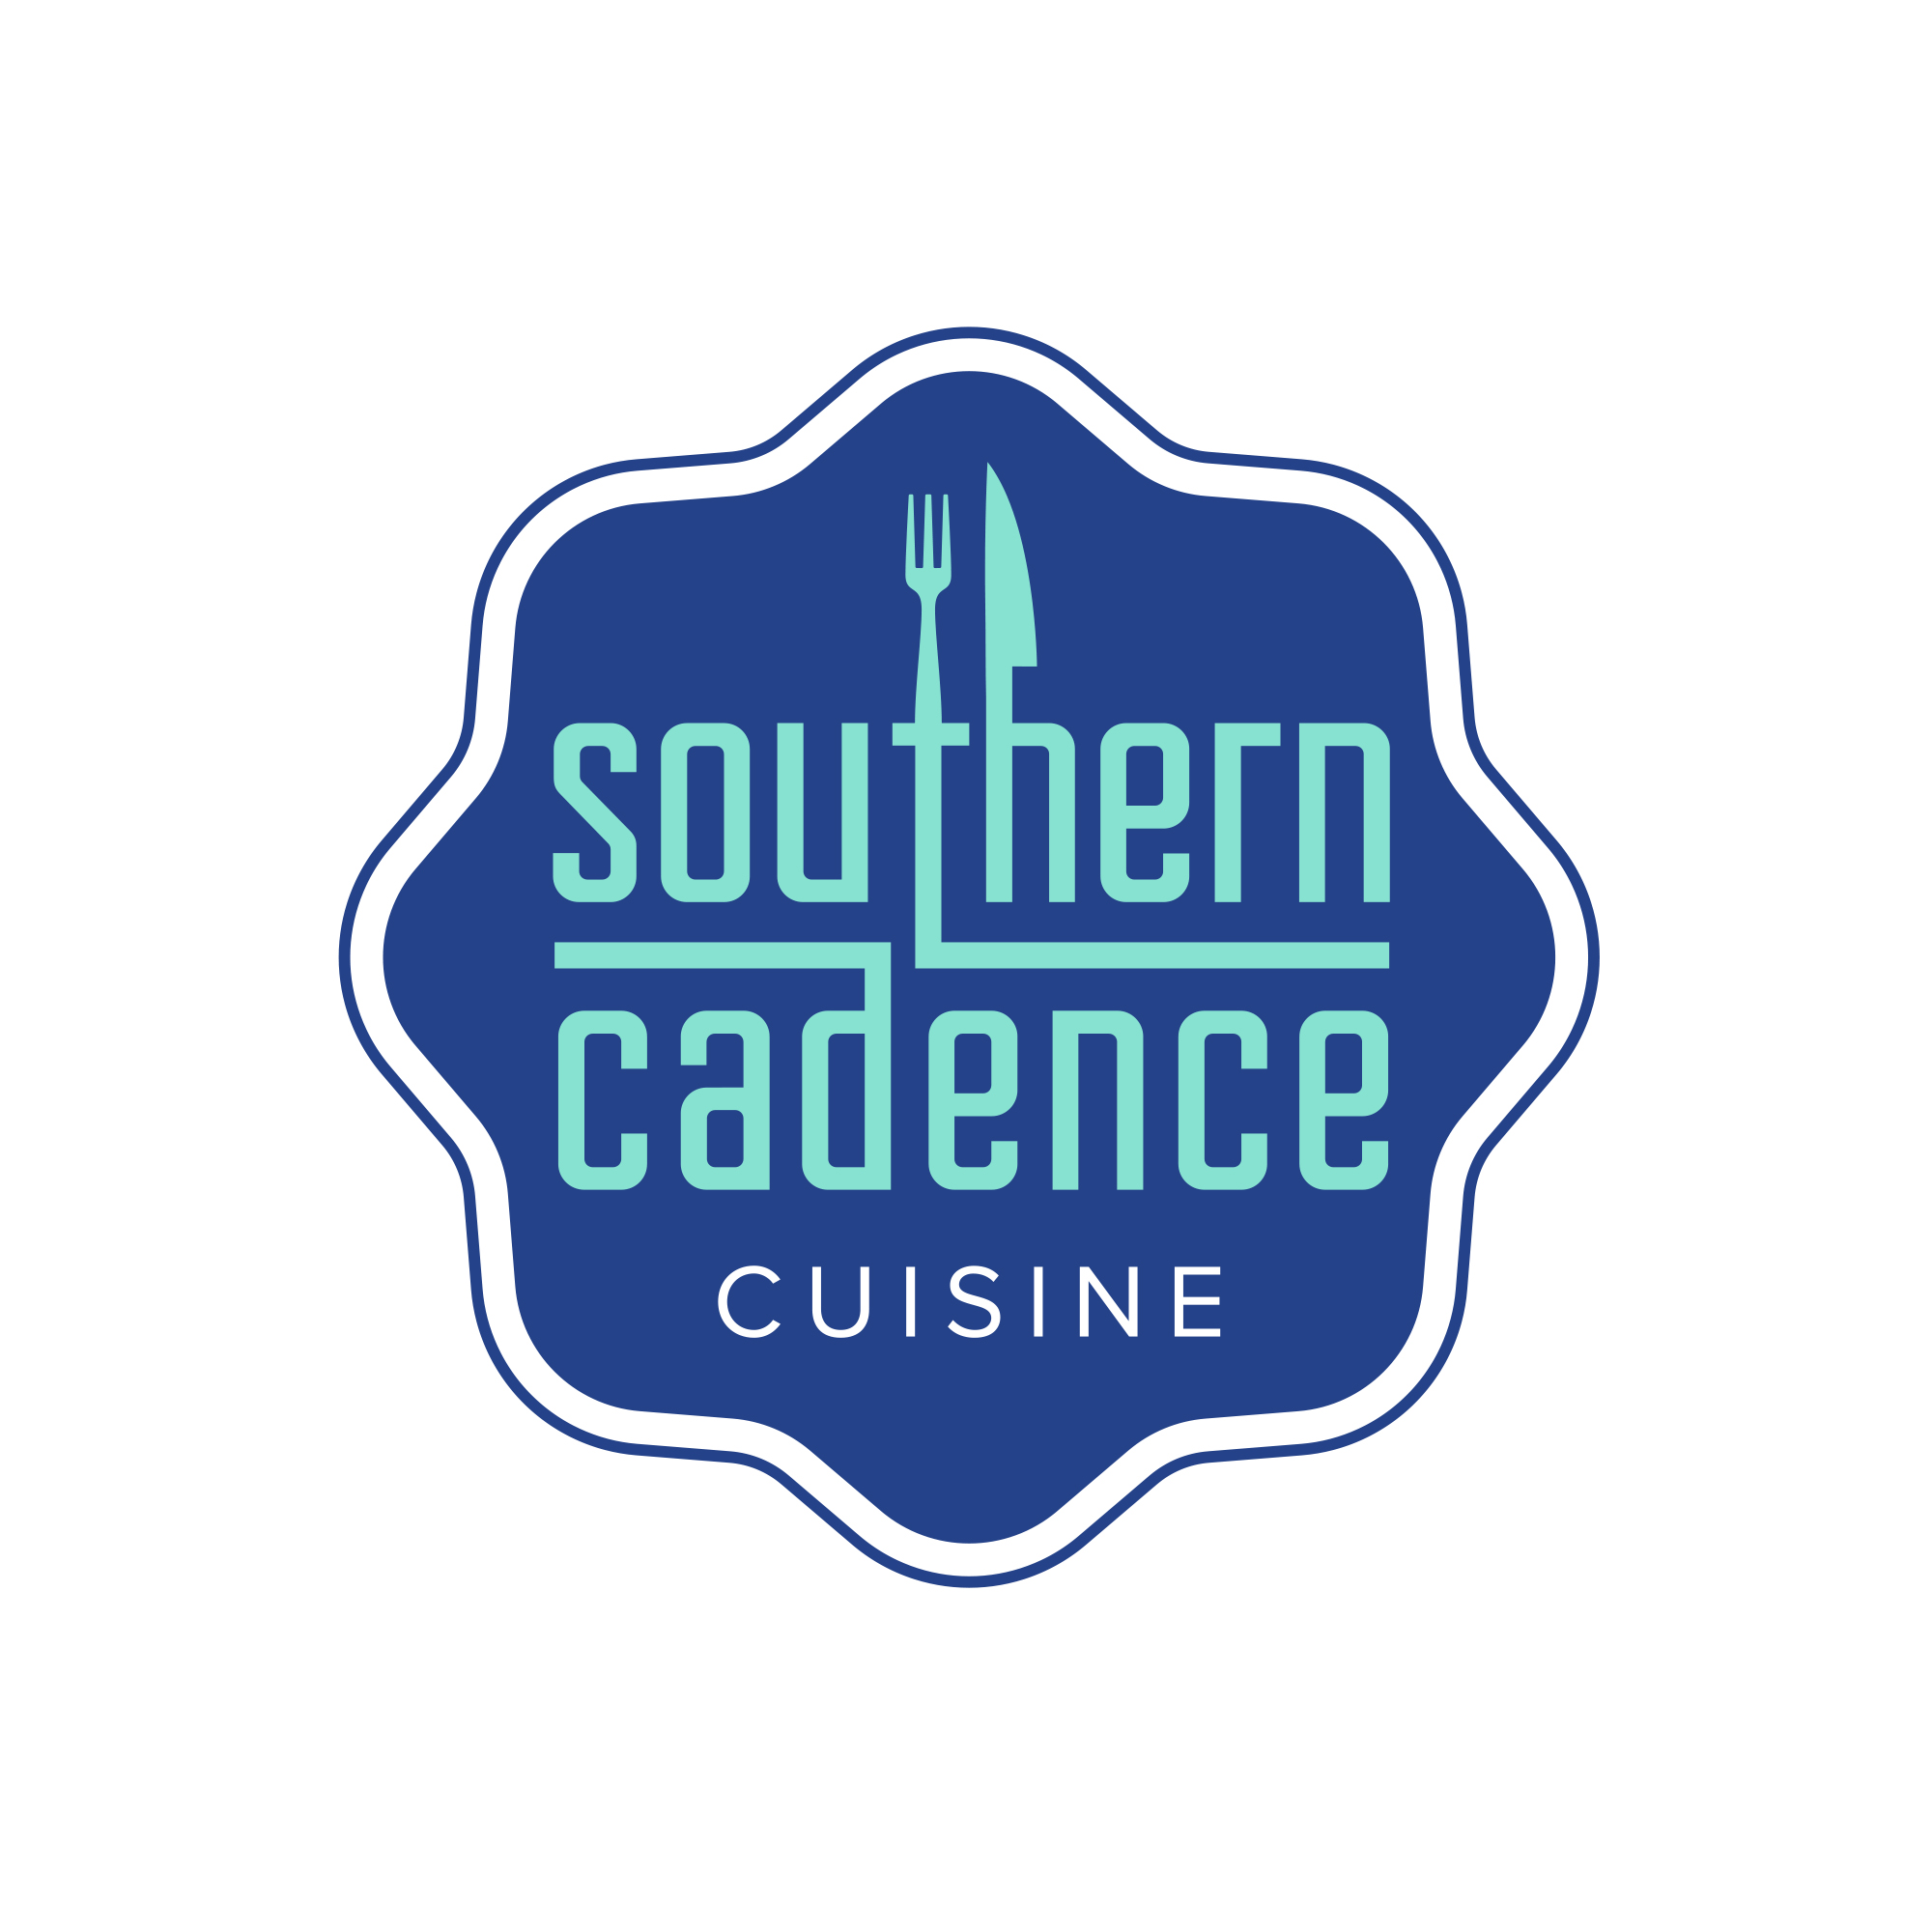 SouthernCadence_RGB.jpg